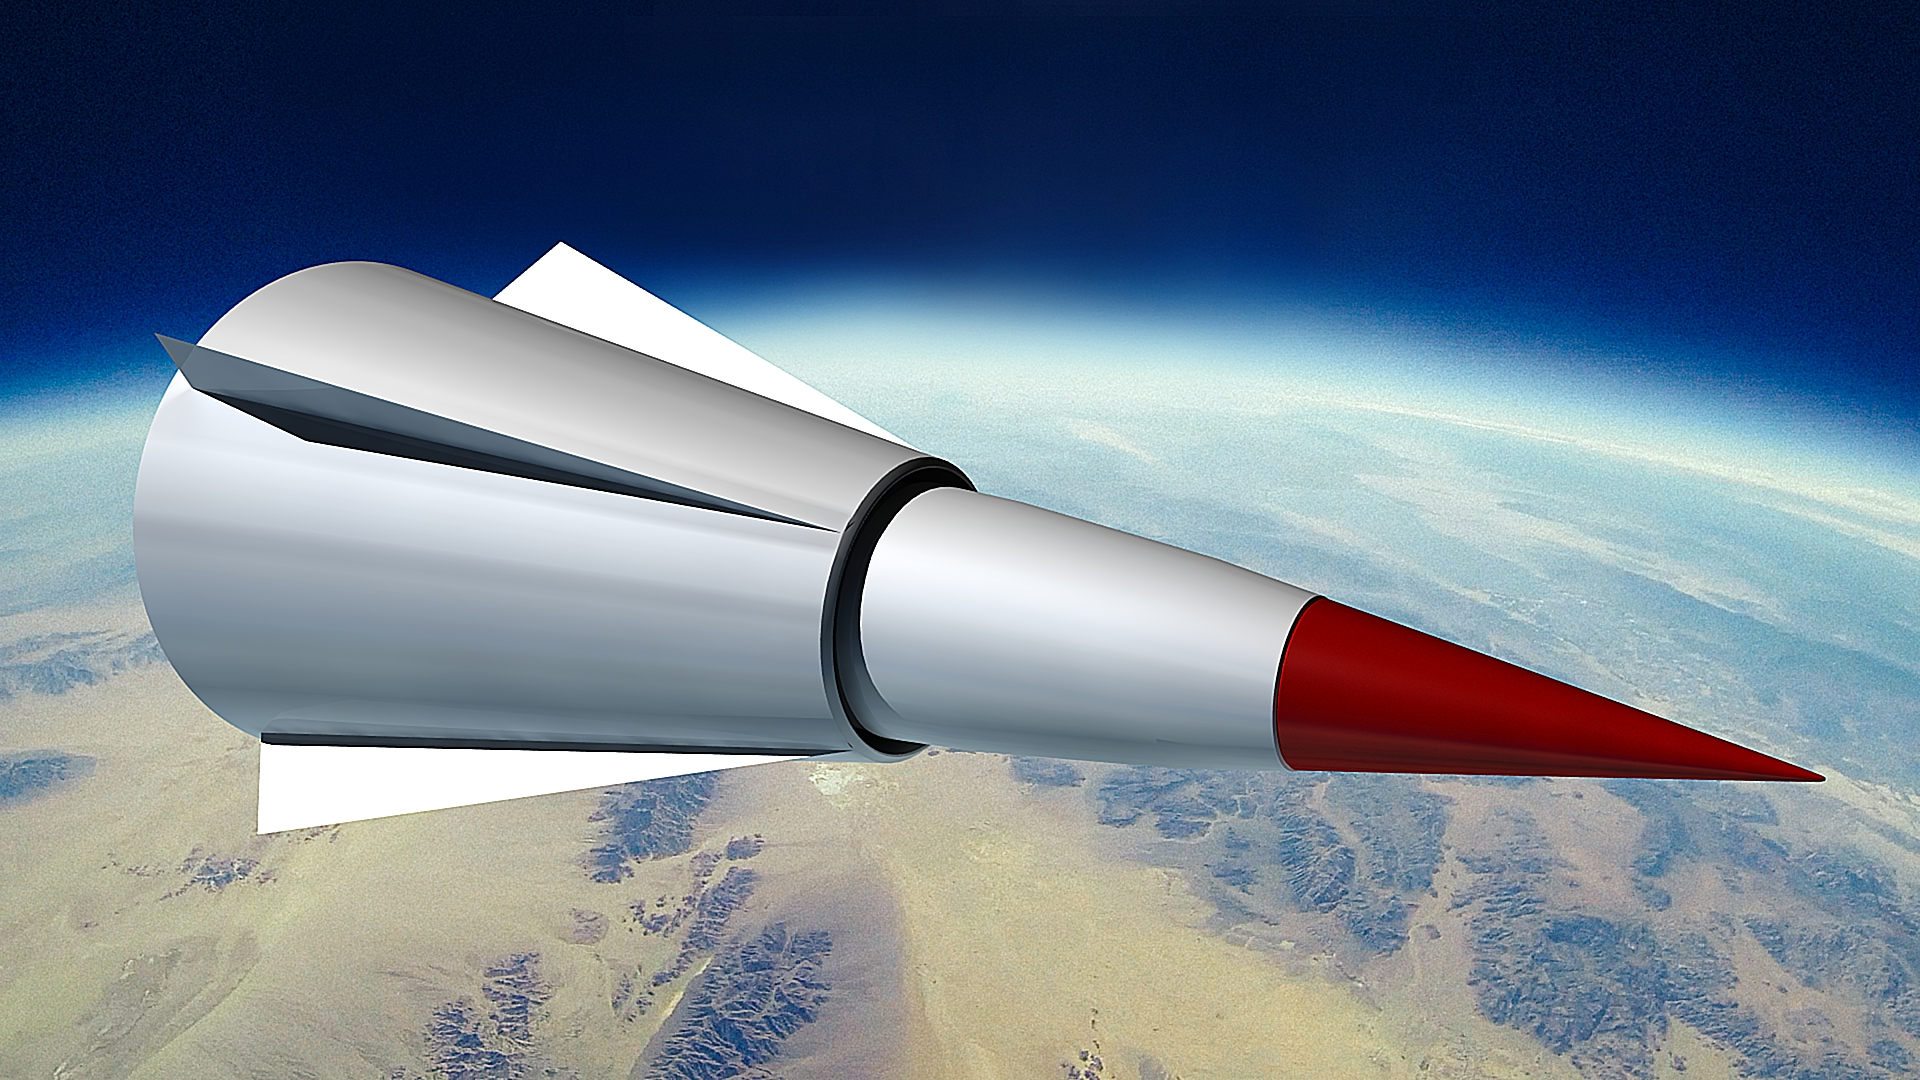 hypersonic ballistic missile